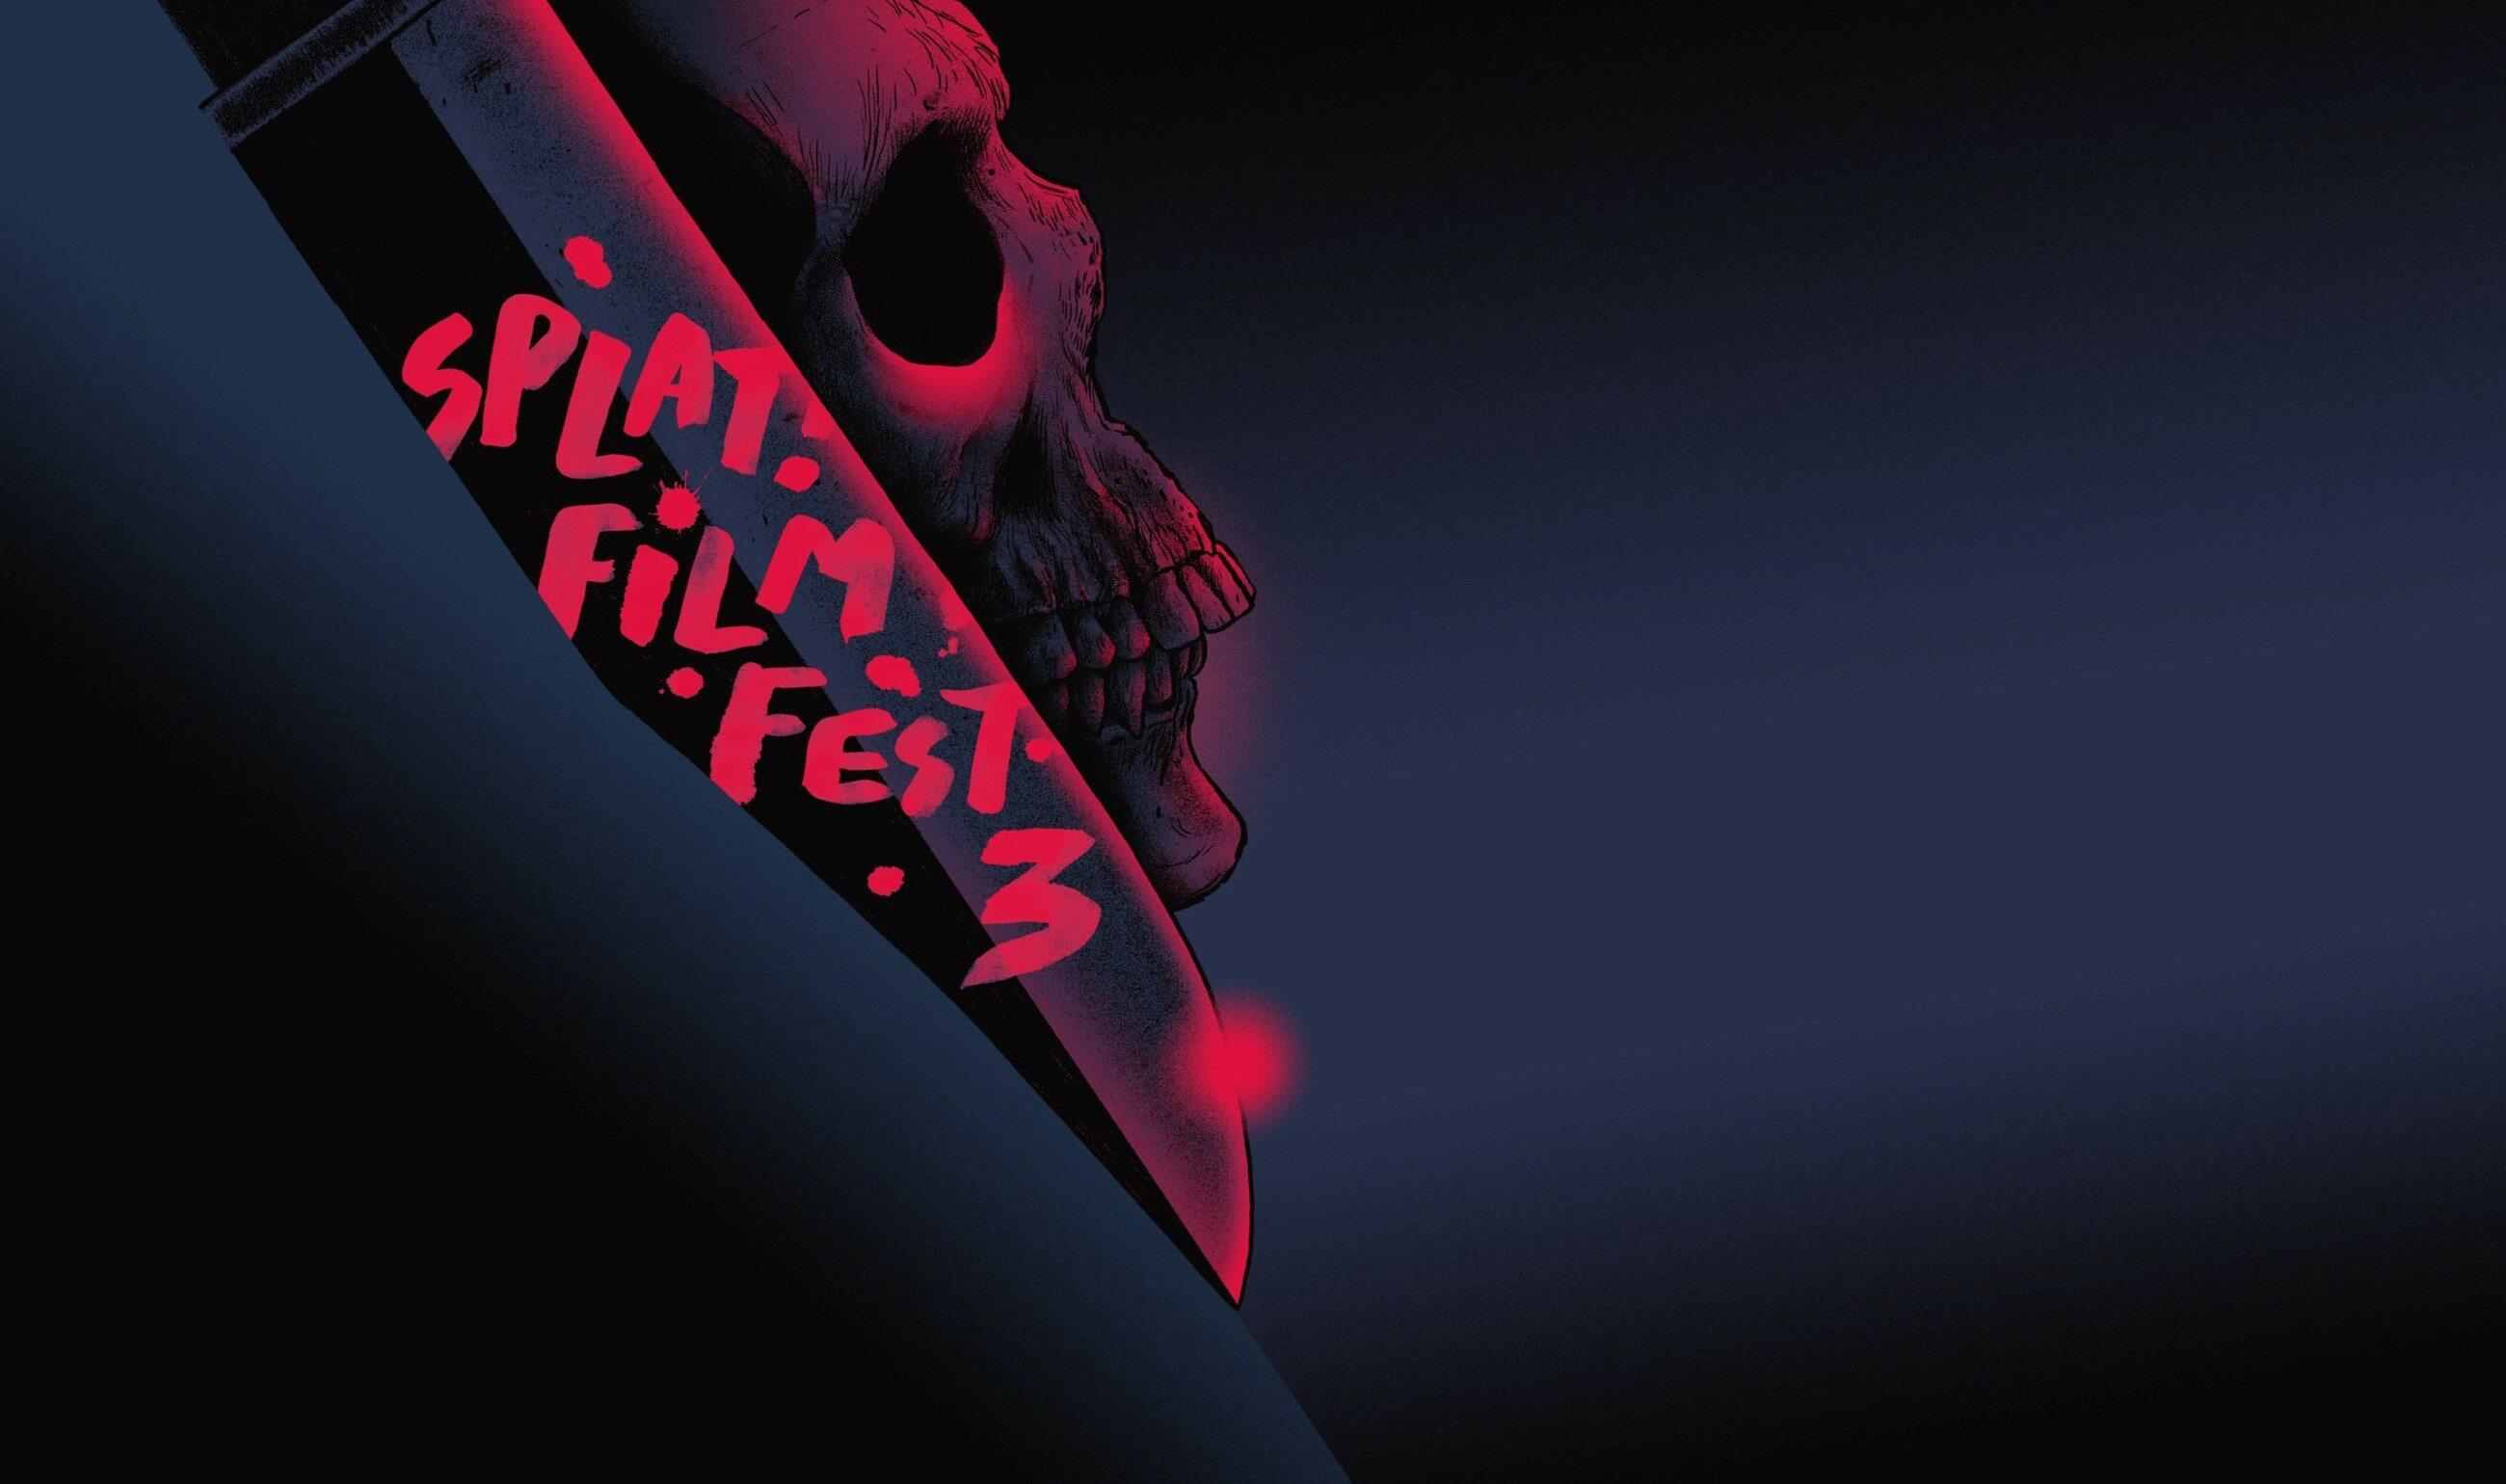 Splat! Film Festival już 15 września!